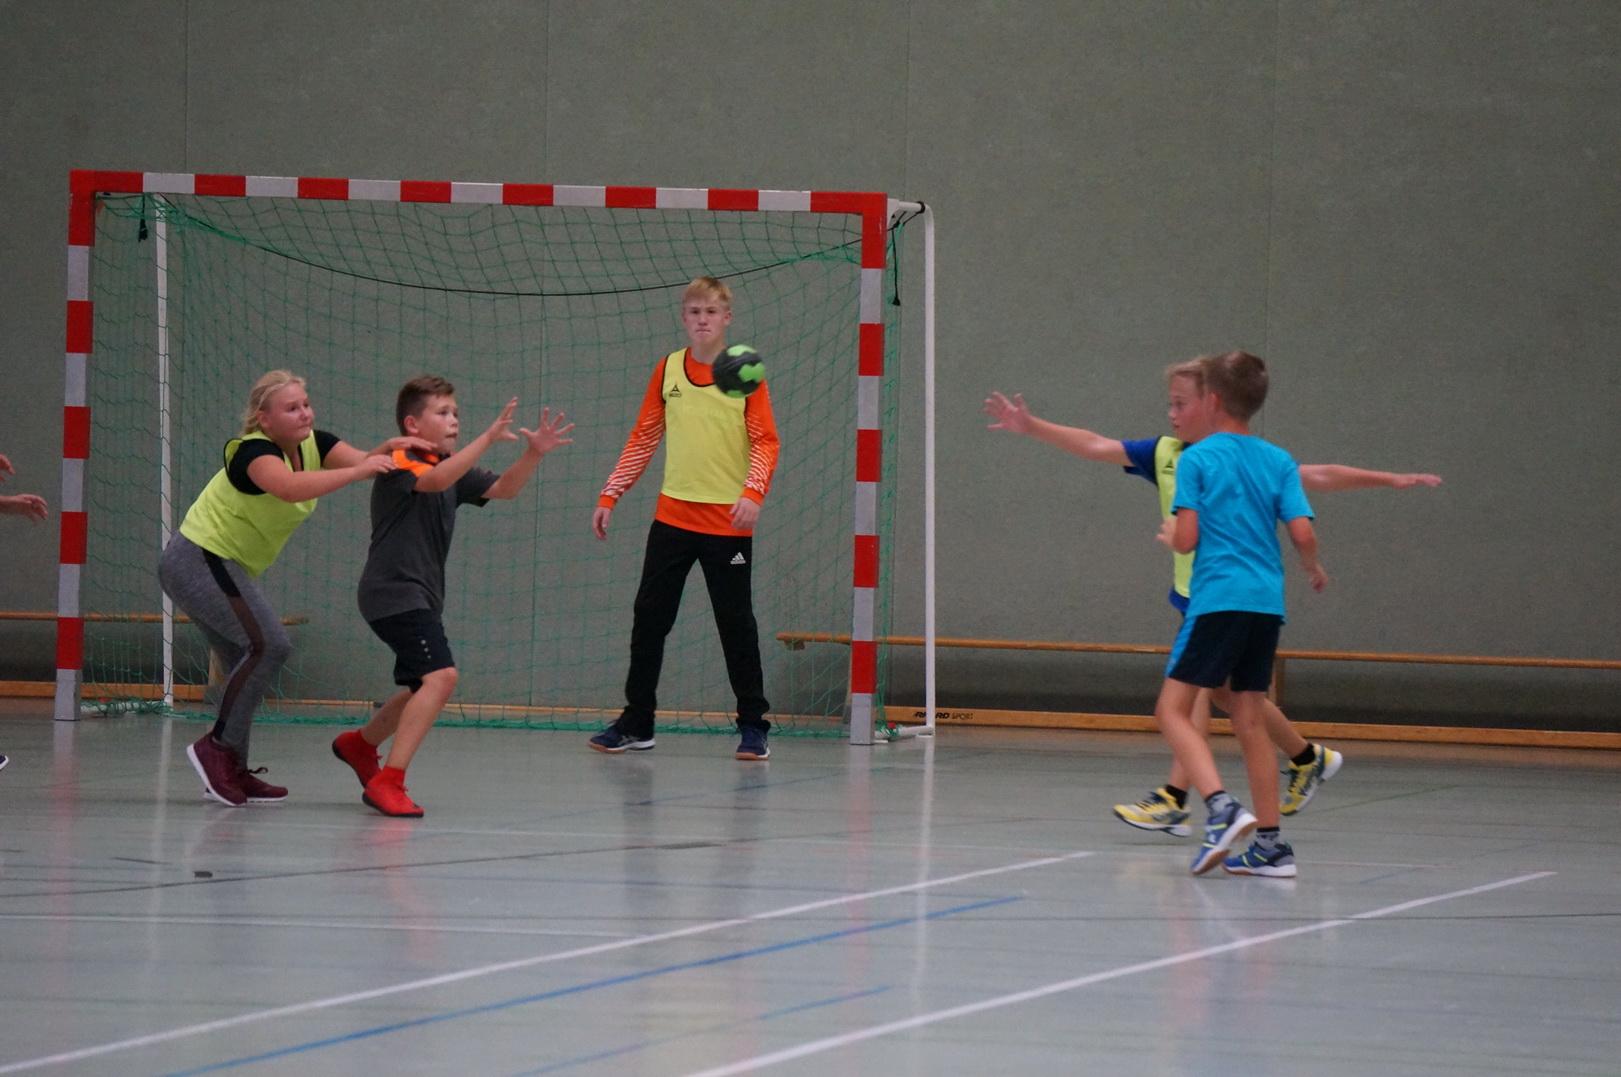 201808_Handballcamp_SDH_MG_124w